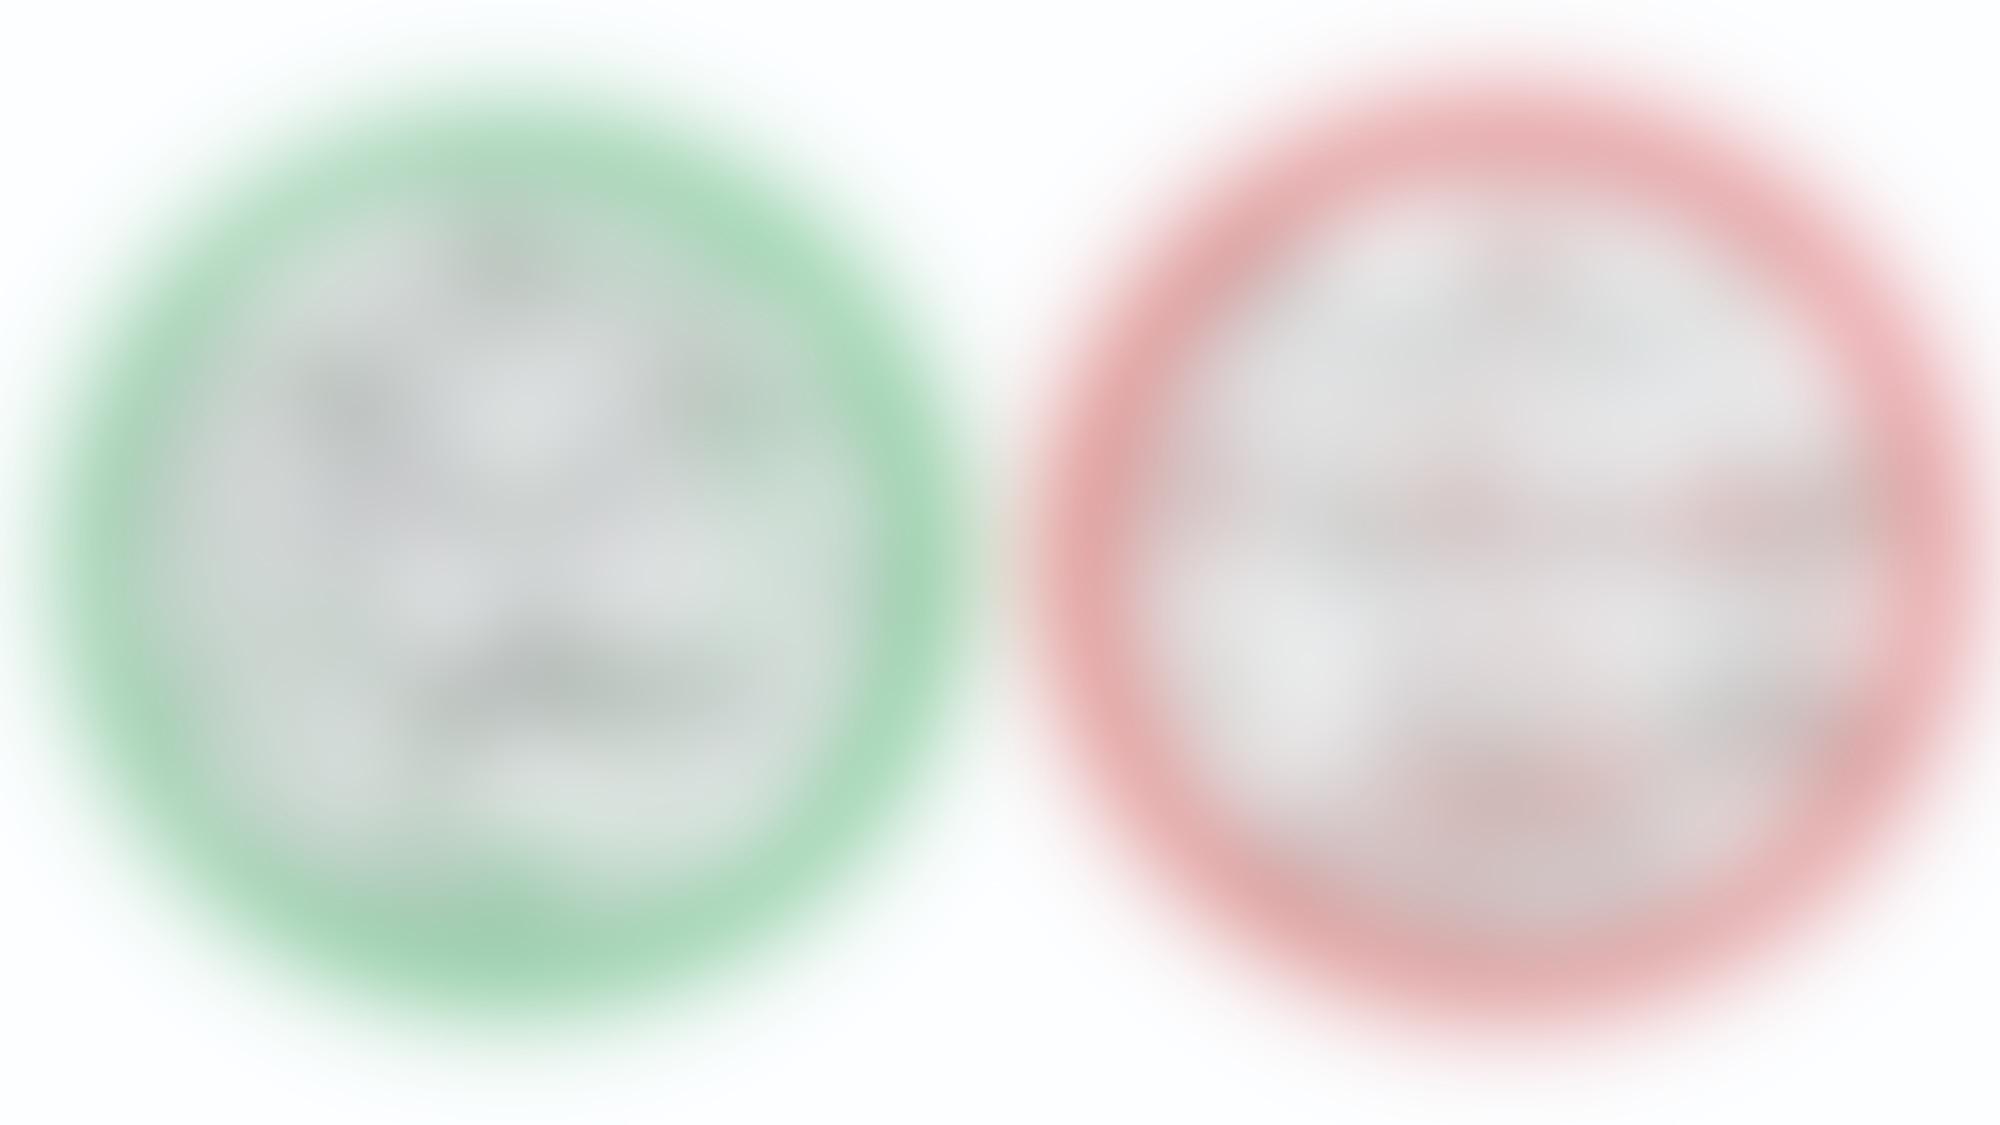 2 Tot and Pastille sketch autocompressfitresizeixlibphp 1 1 0max h2000max w3 D2000q80s0024cbf5901efc65d762ded5b368537a